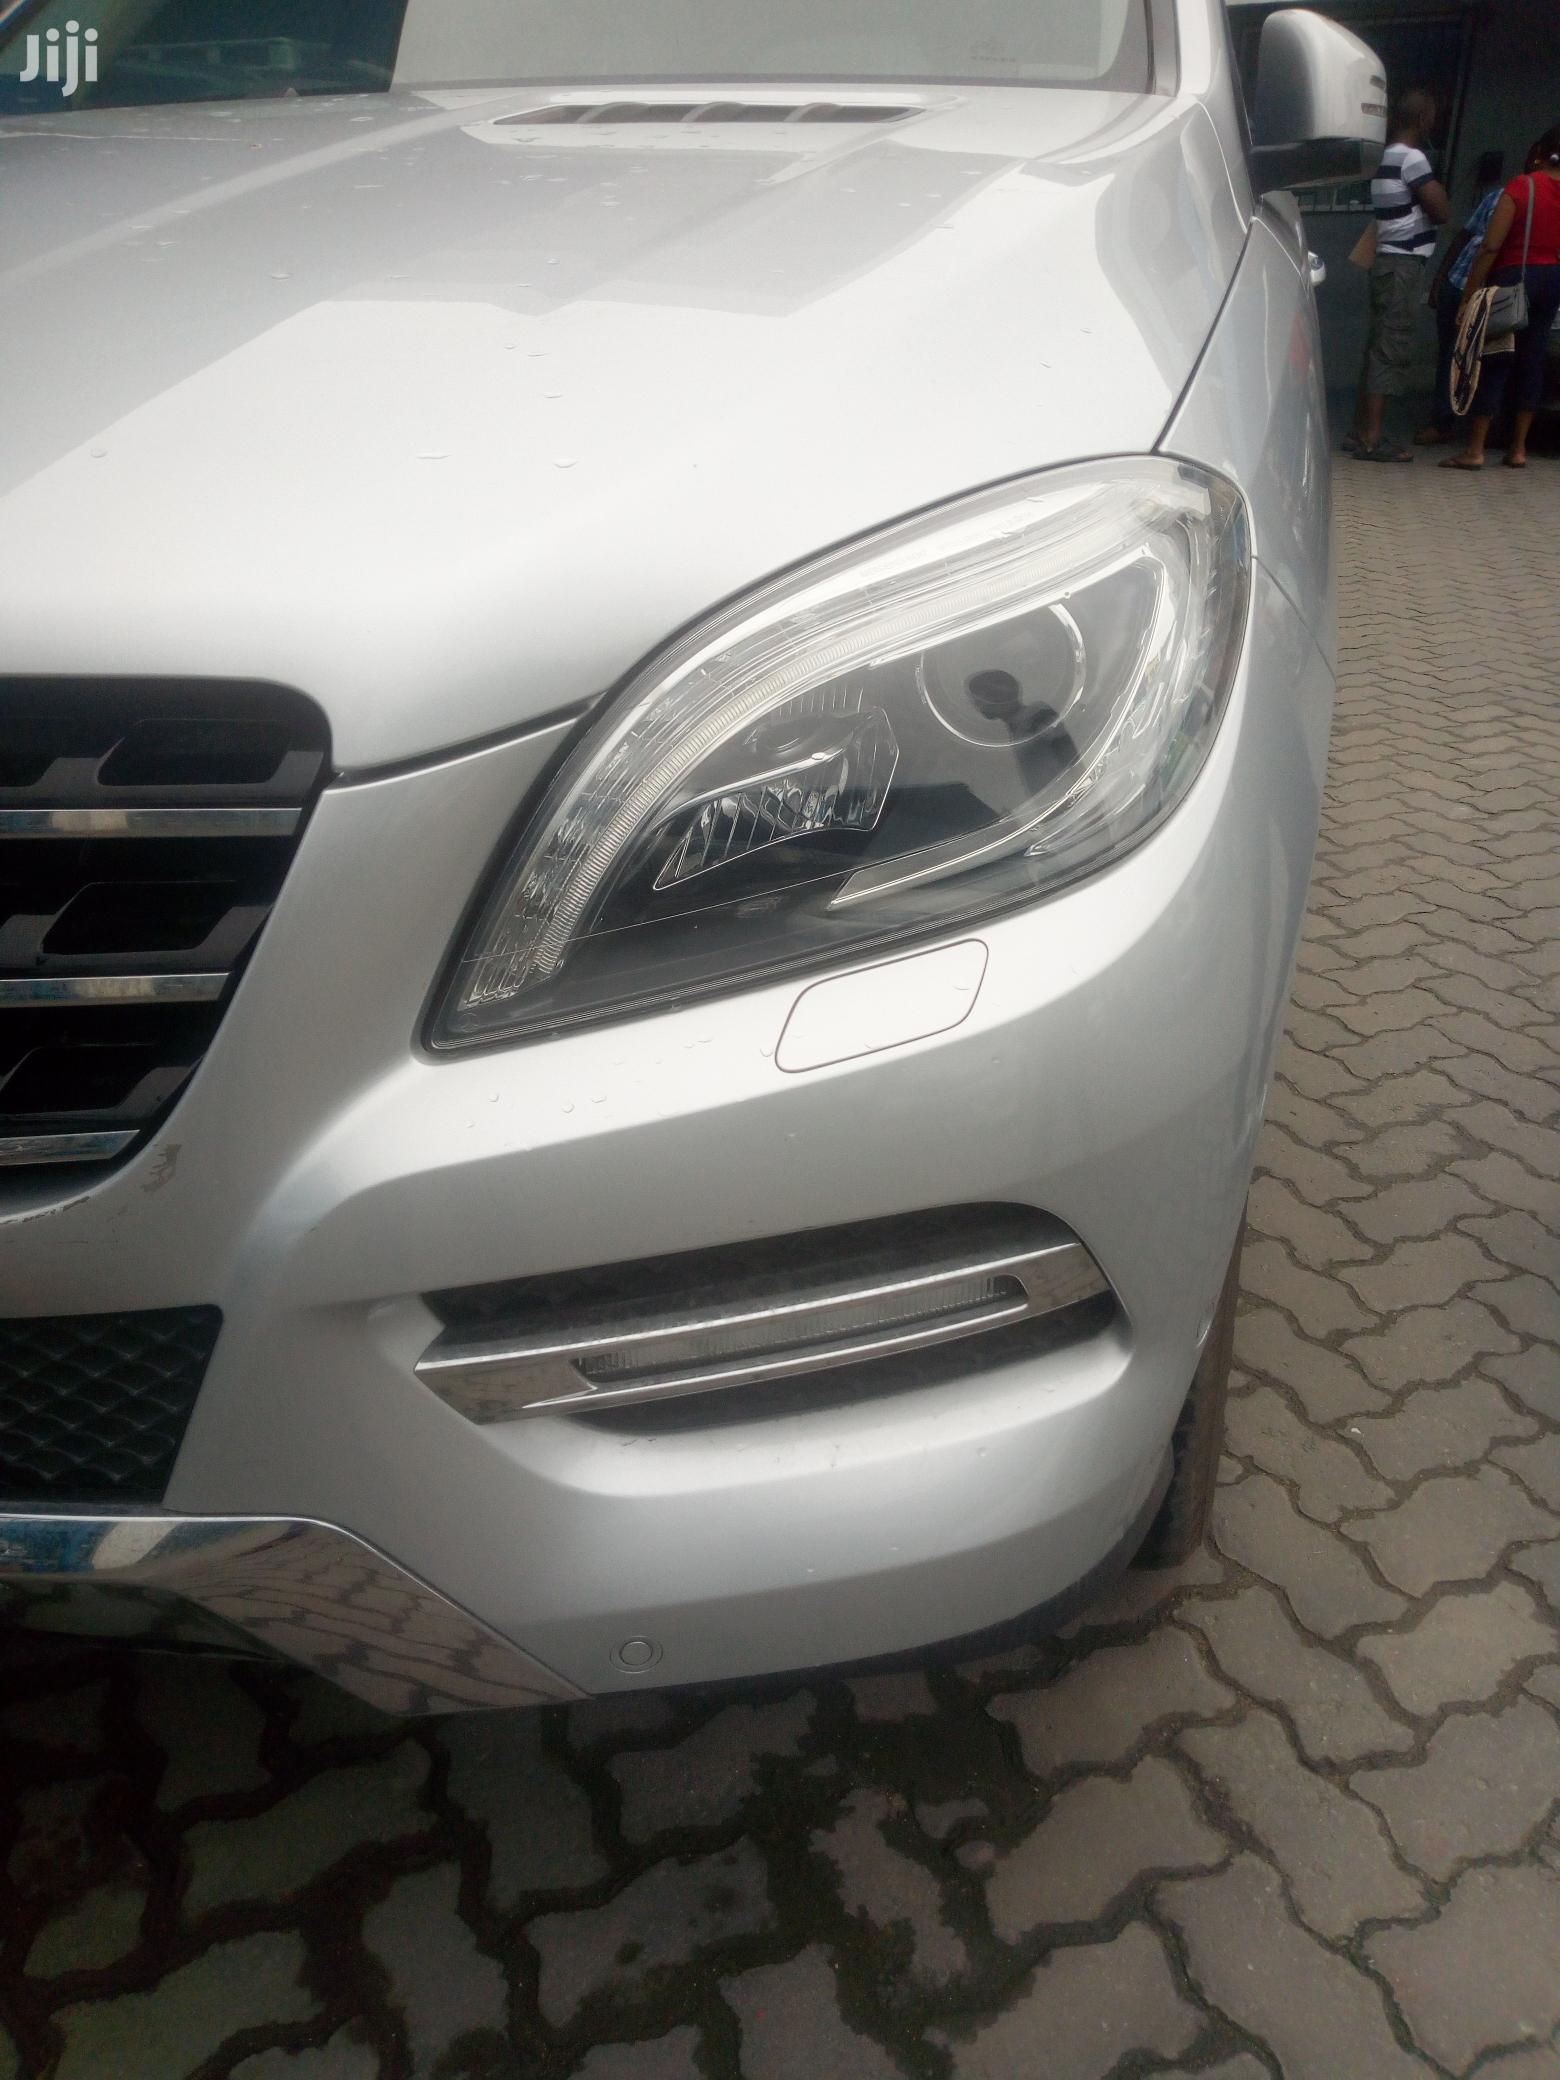 Archive: Mercedes-Benz M Class 2013 White